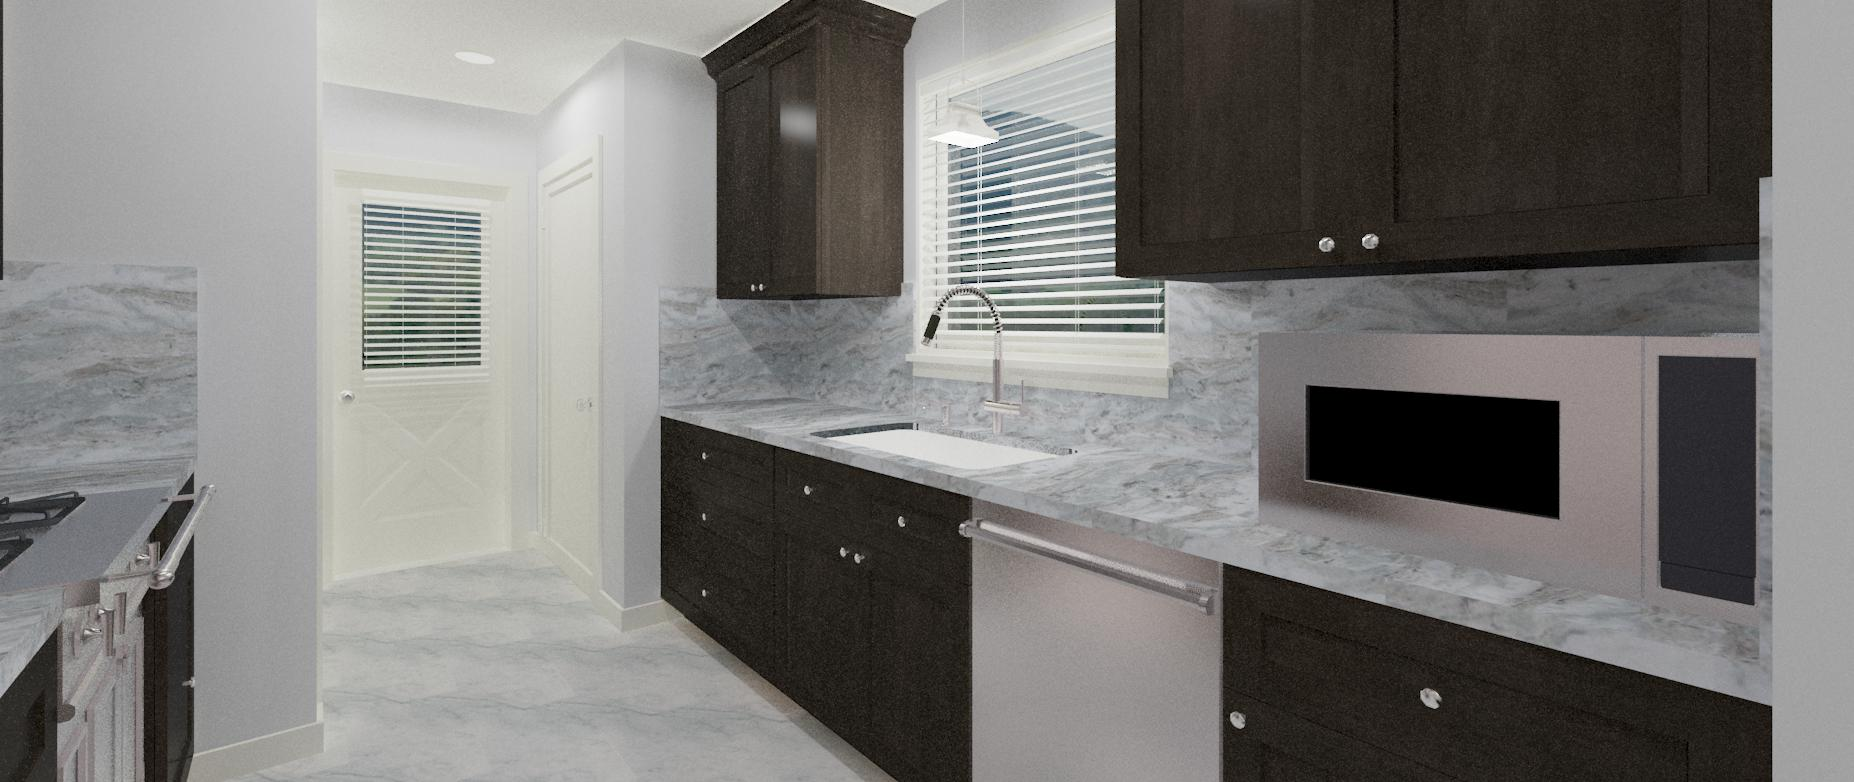 san antonio remodeler   kitchen remodeling   bath remodeling